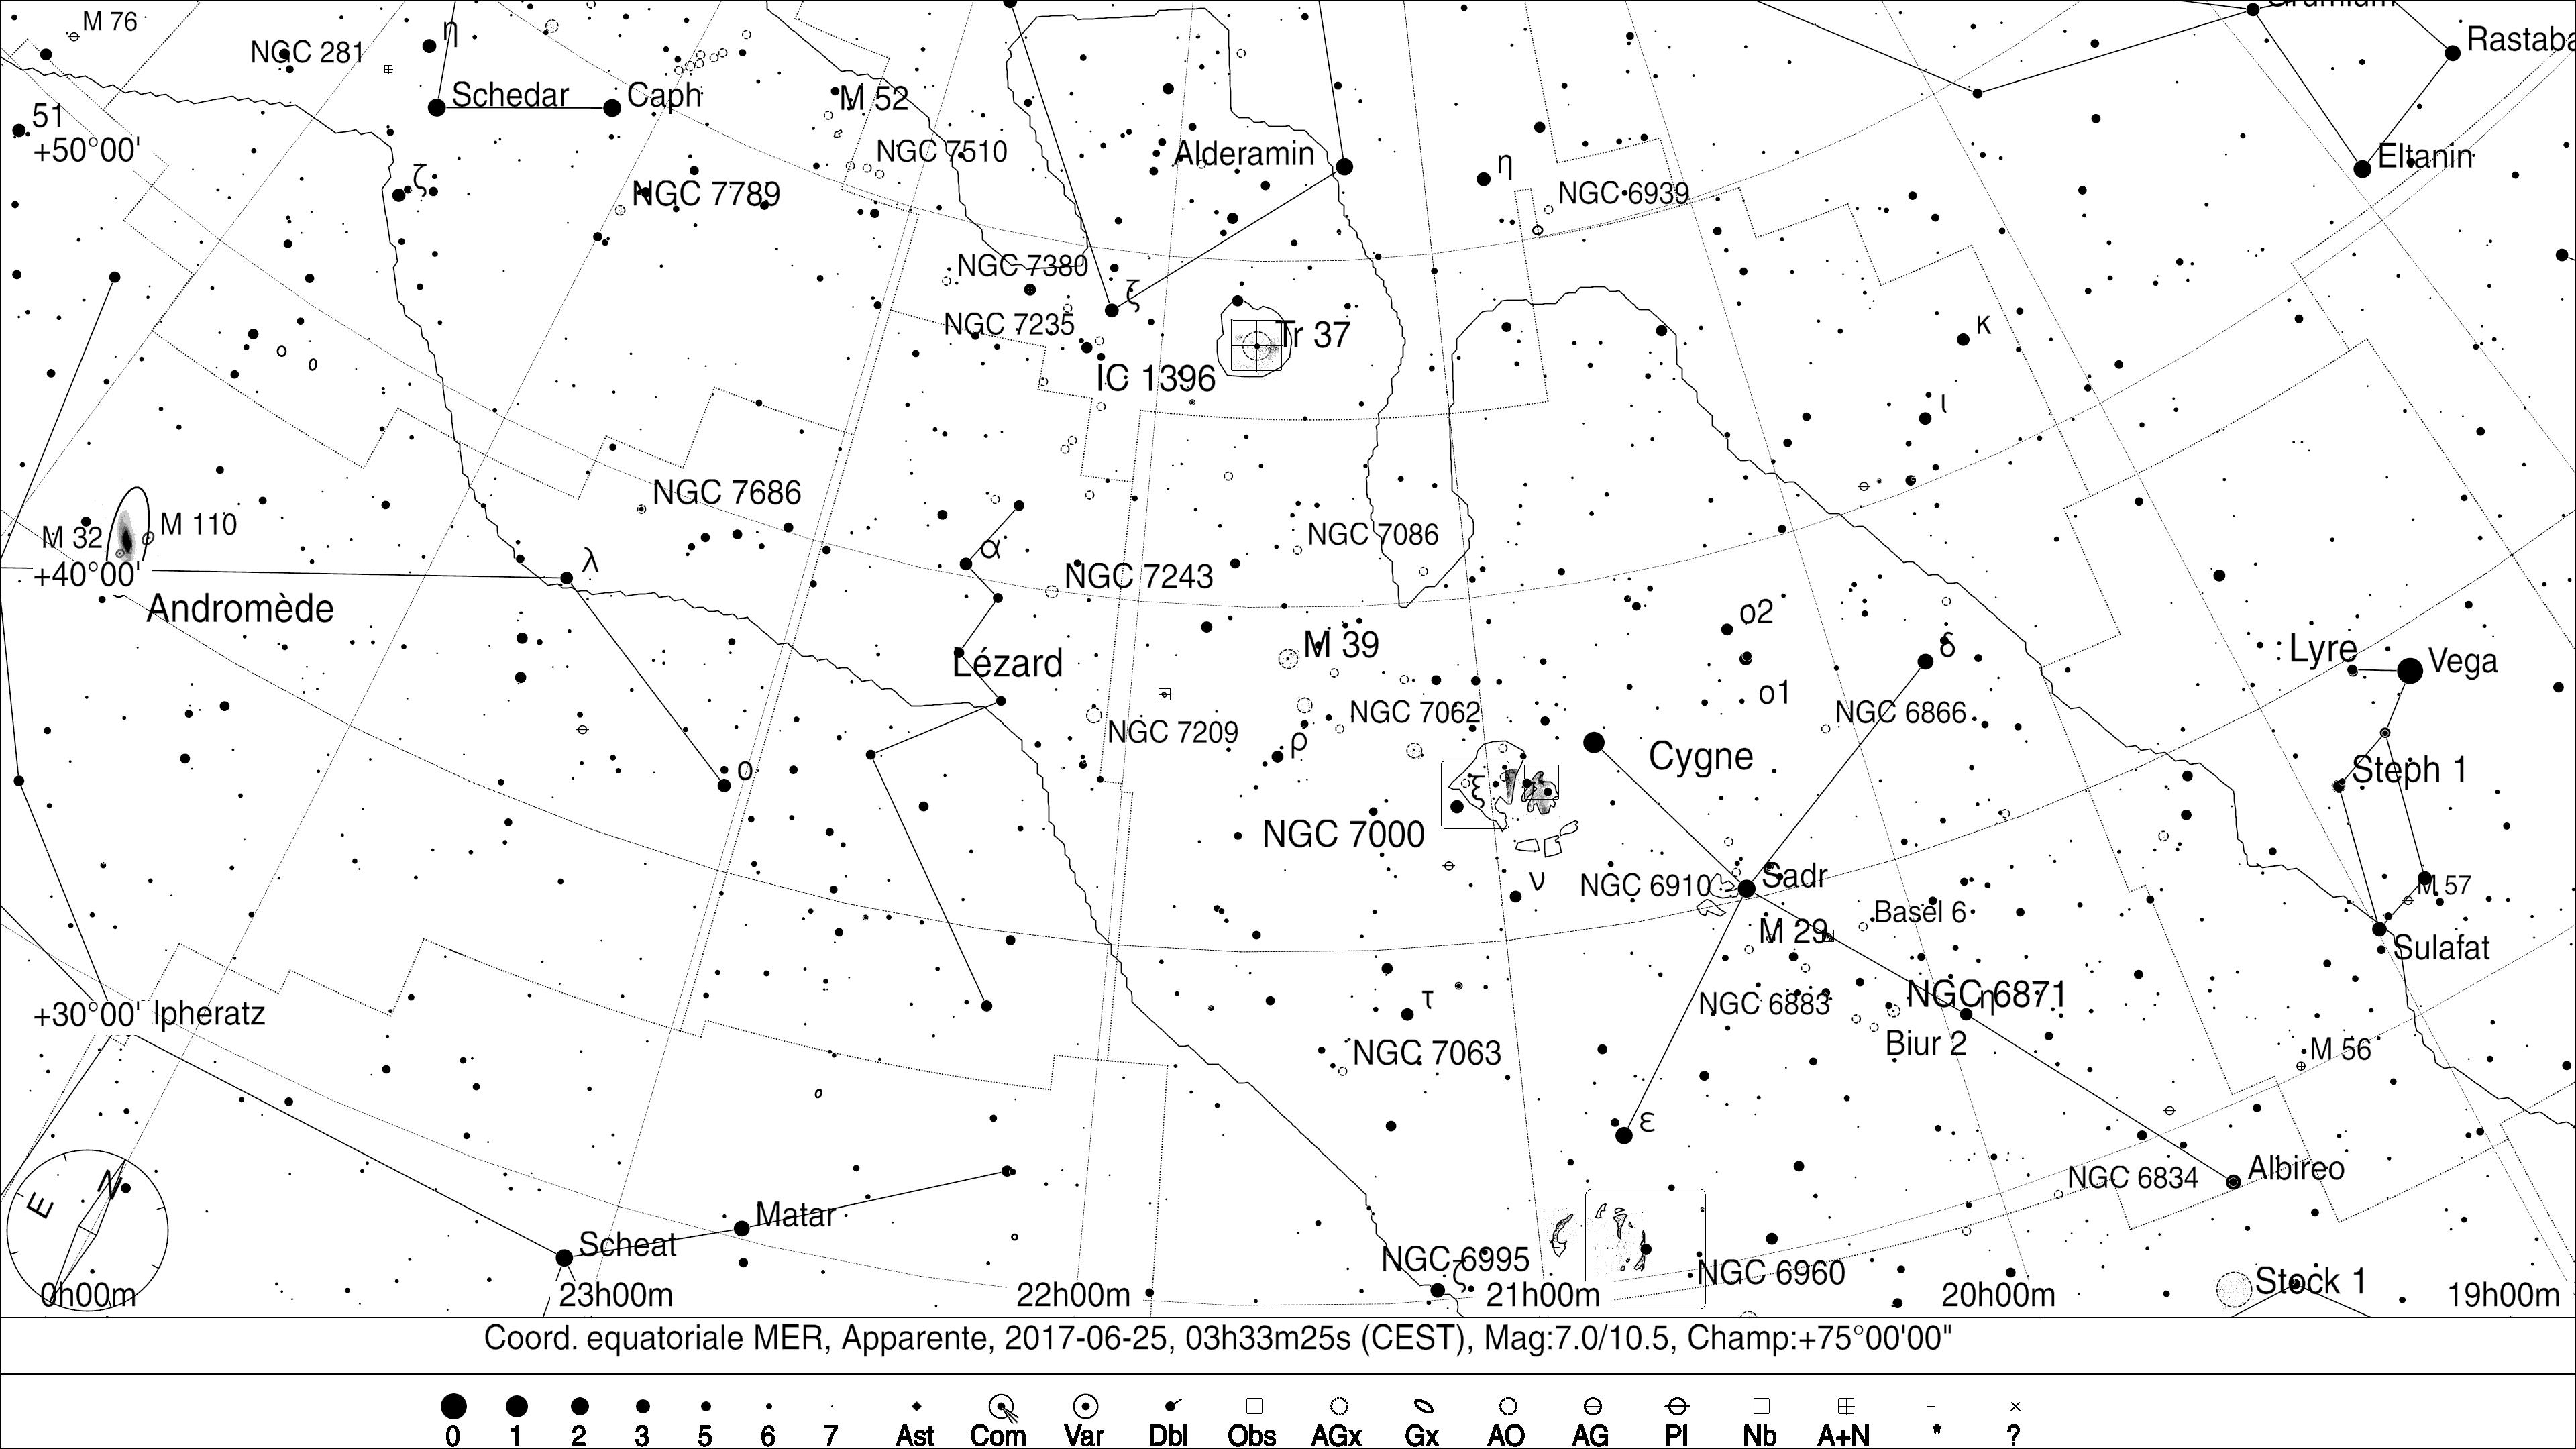 M39_75